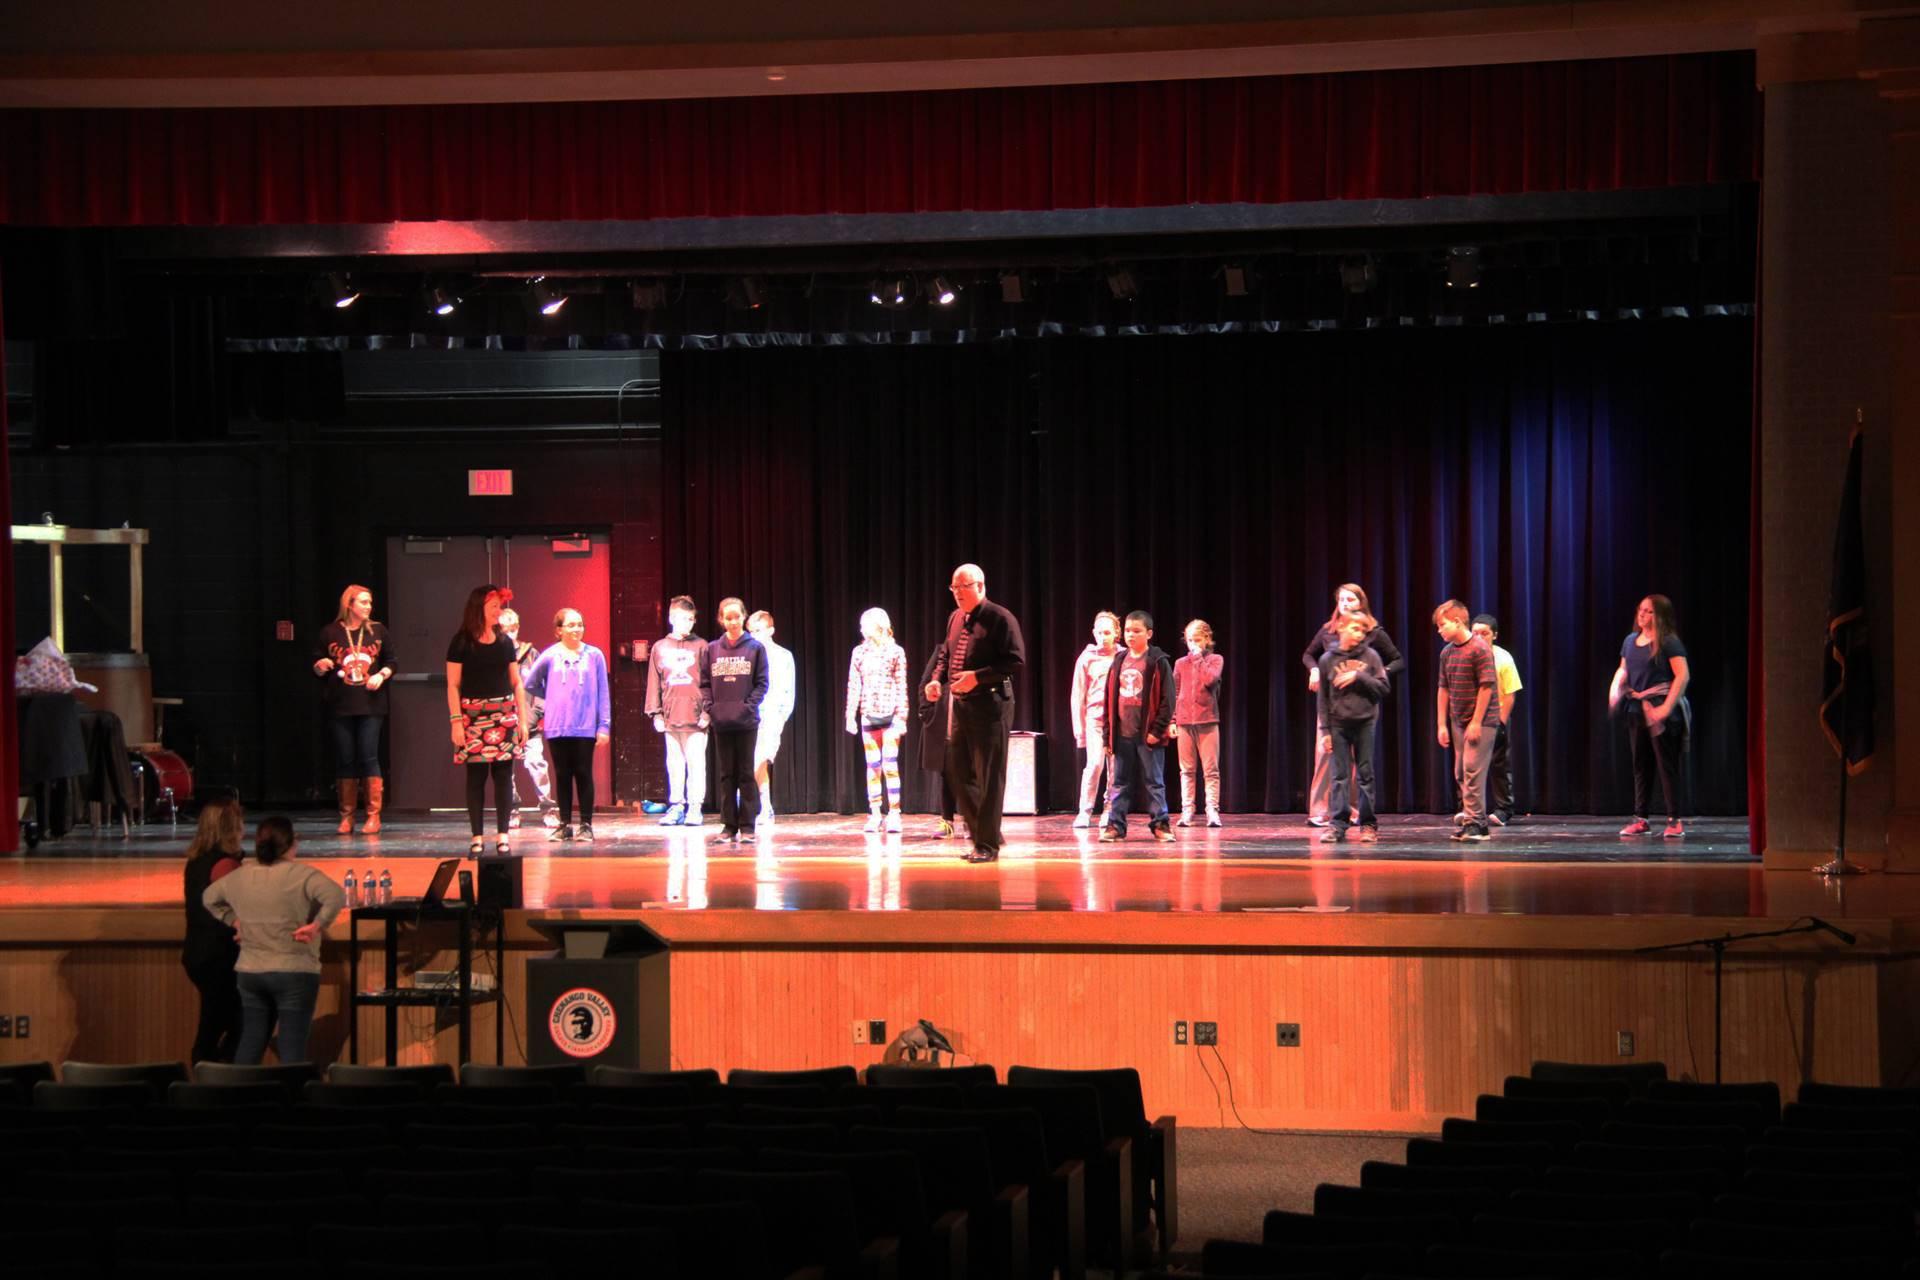 far shot of students learning salsa dancing